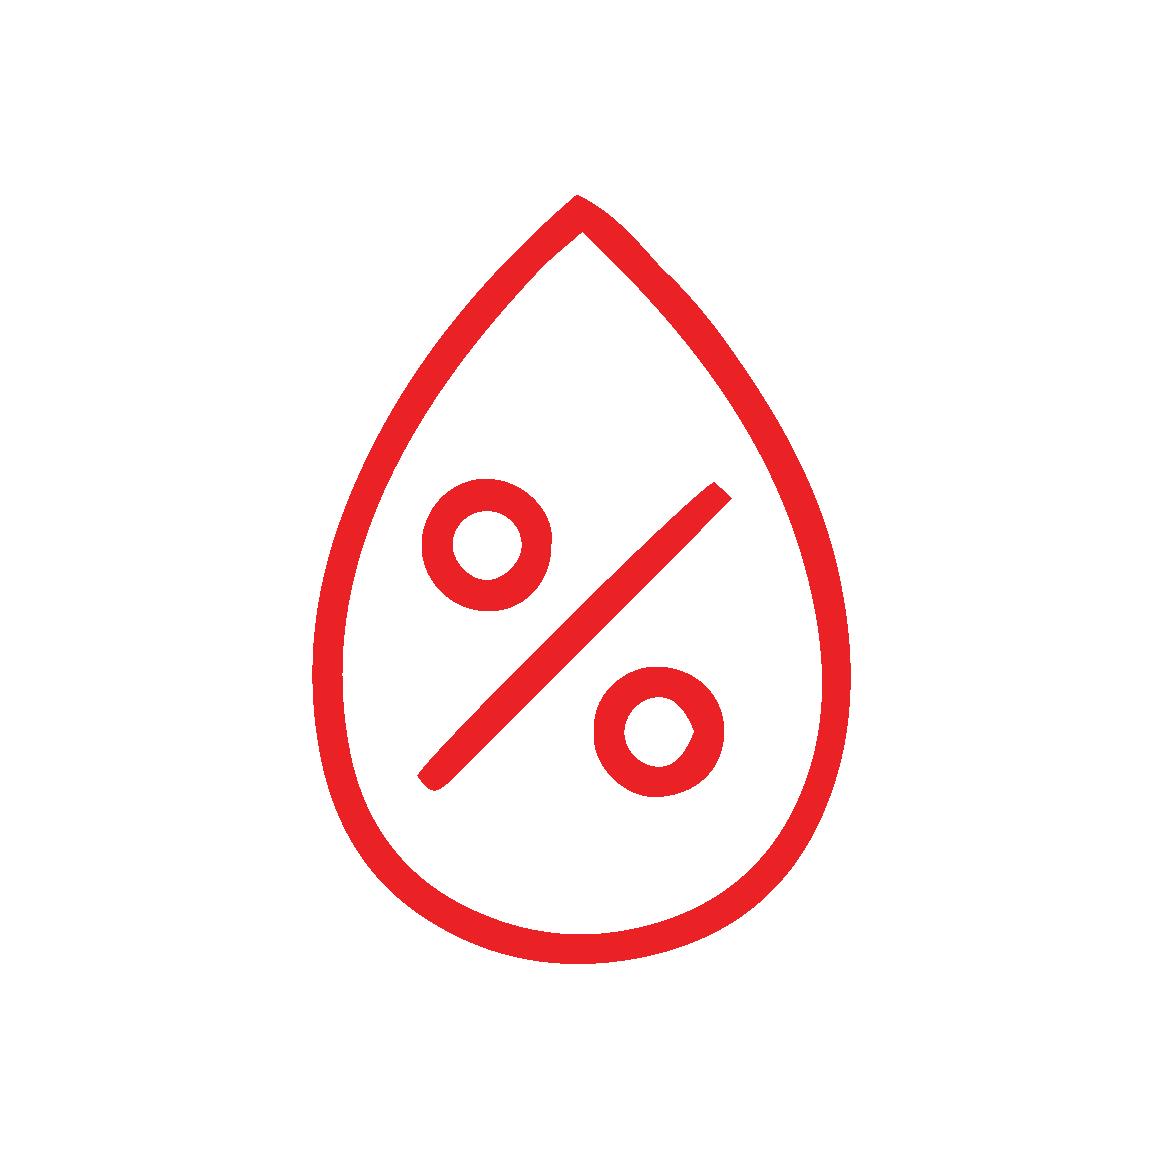 Geotechnical Investigation moisture icon